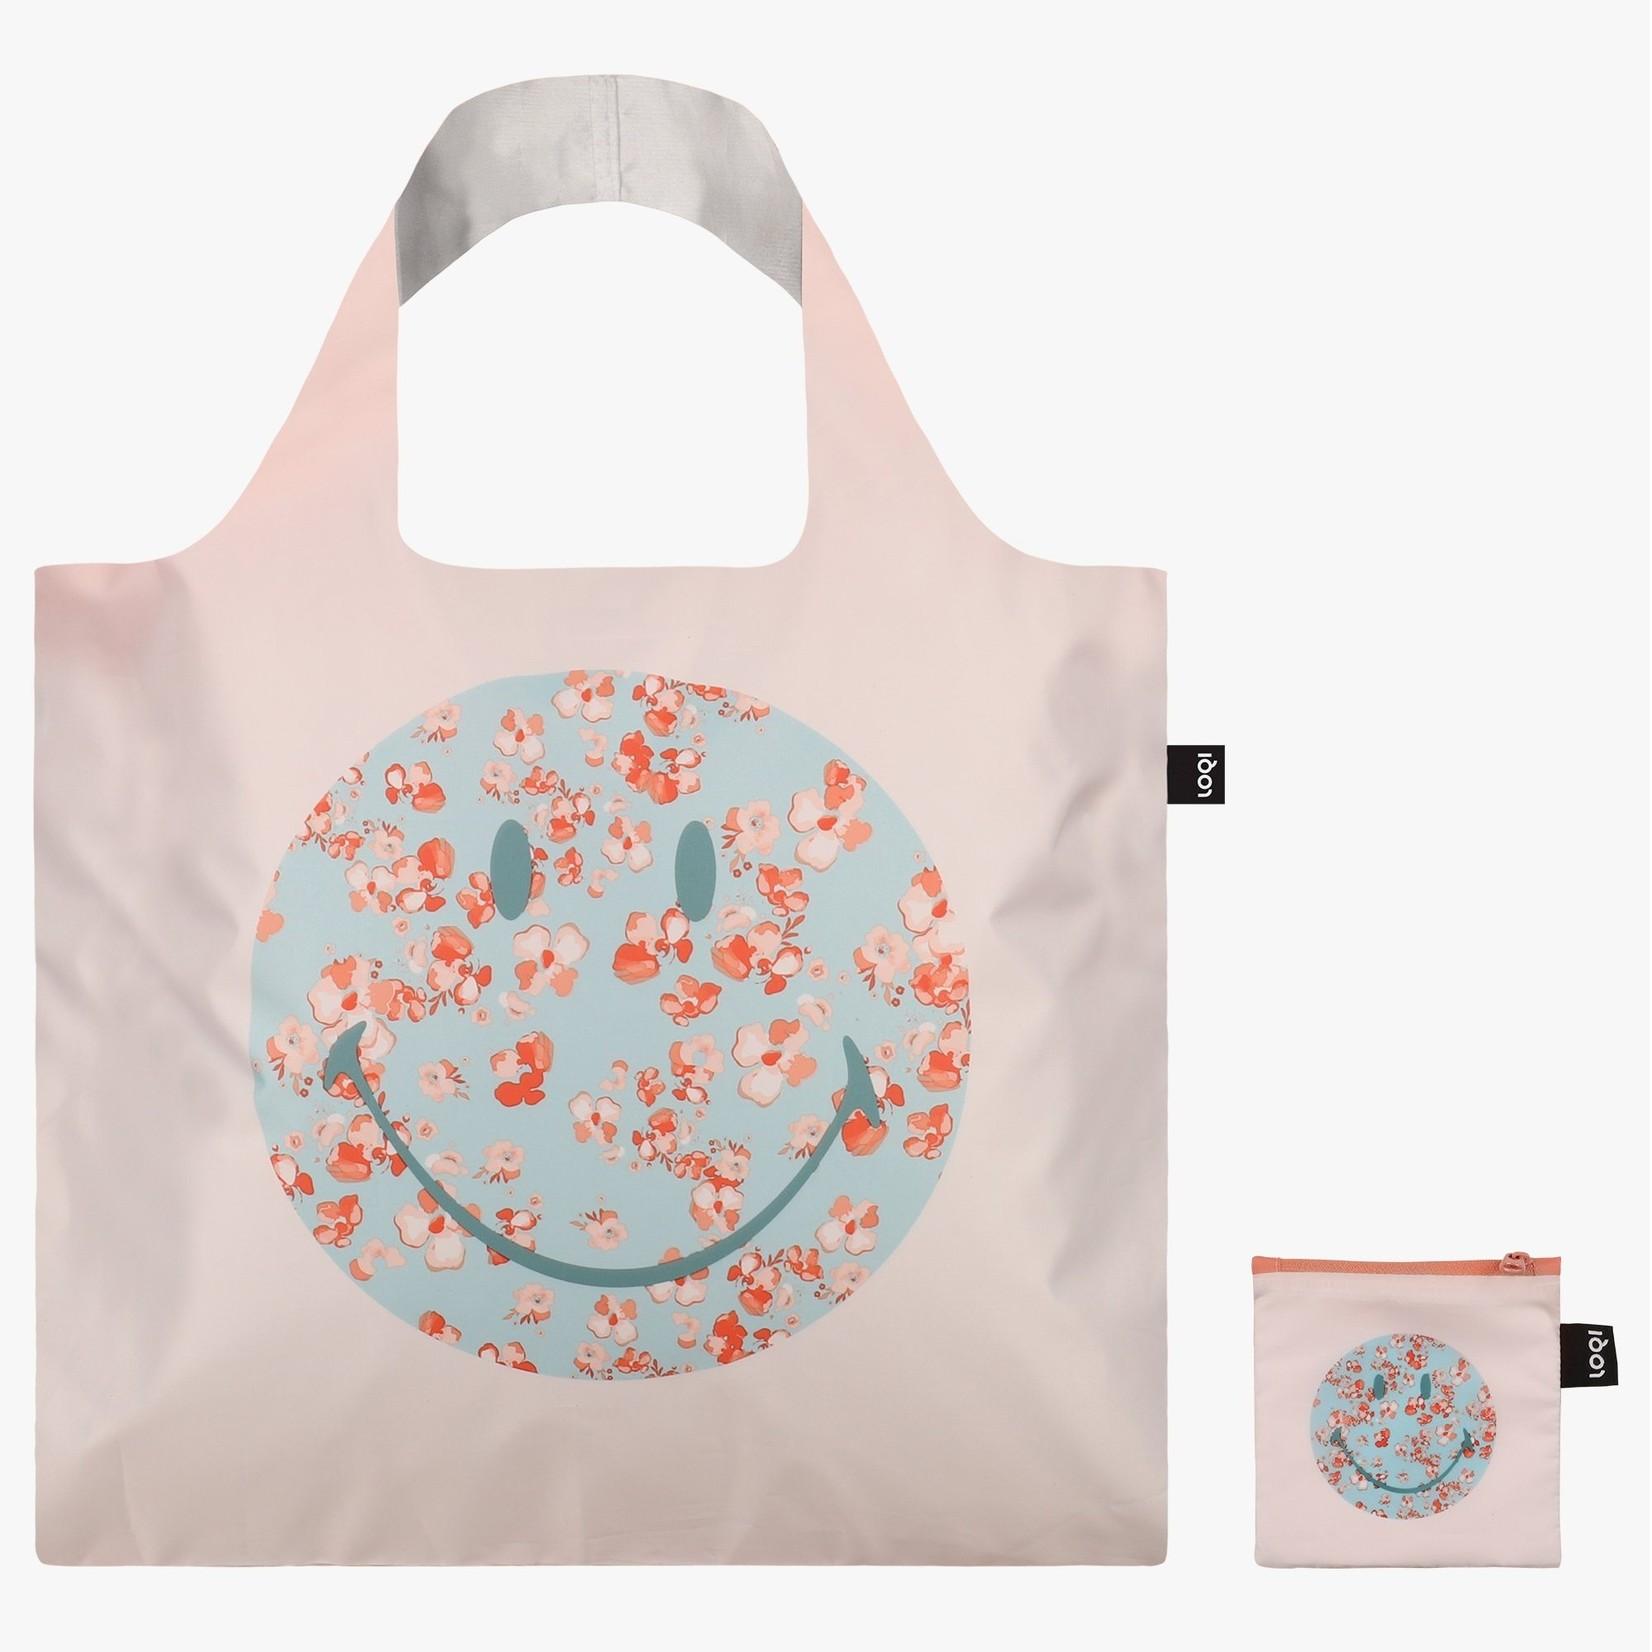 Loqi Bag: Smiley Blossom